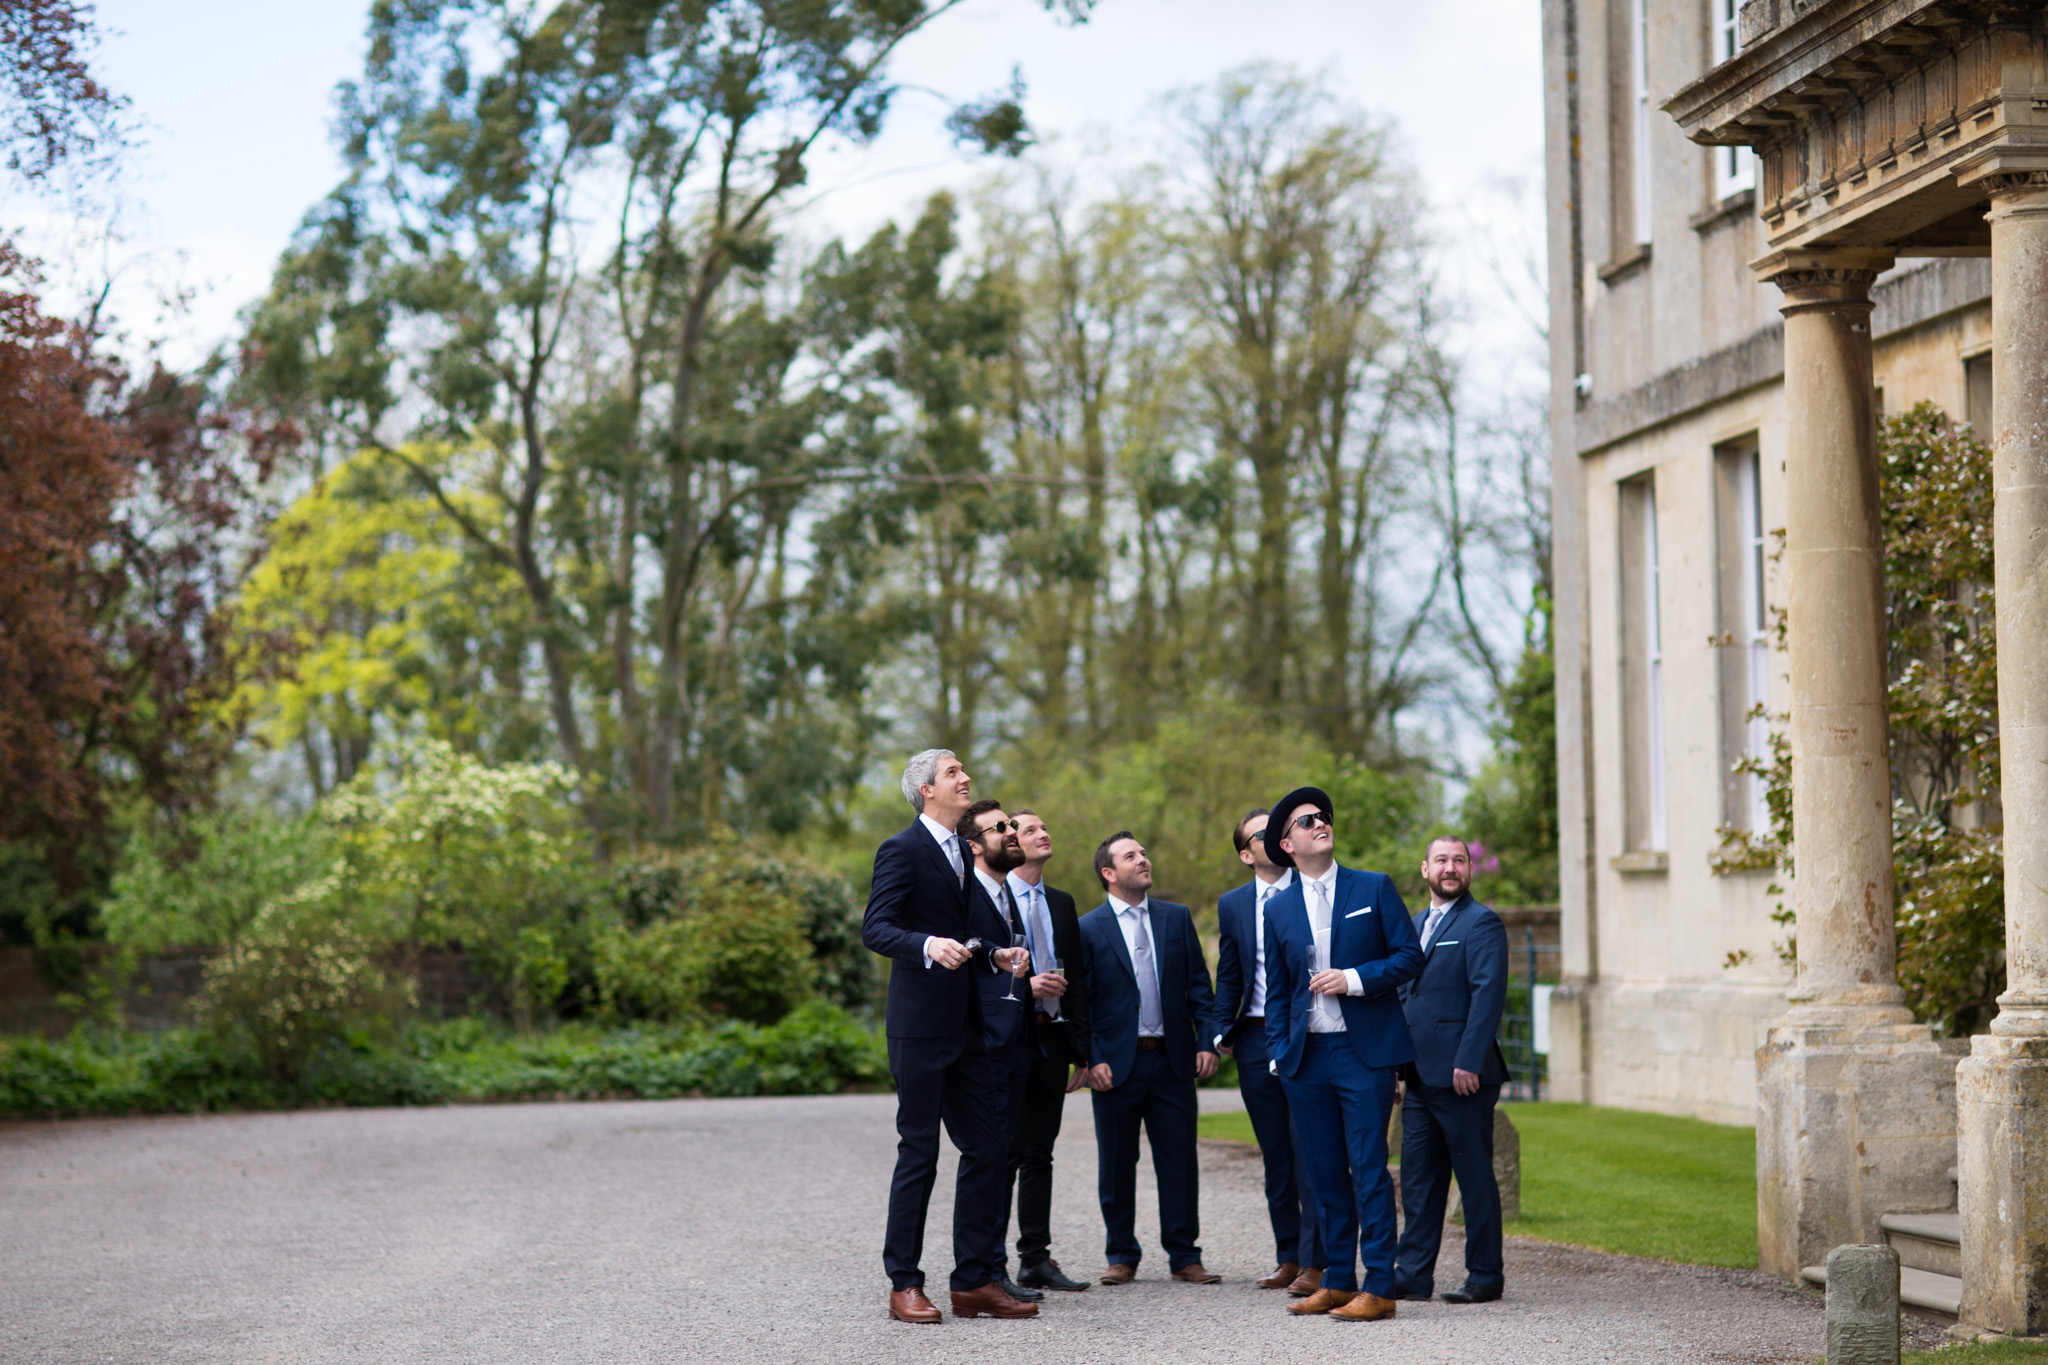 Mark_Barnes_Gloucester_Wedding_Photographer_Elmore_Court_Wedding_Photography_Mike+Kelly-9.jpg